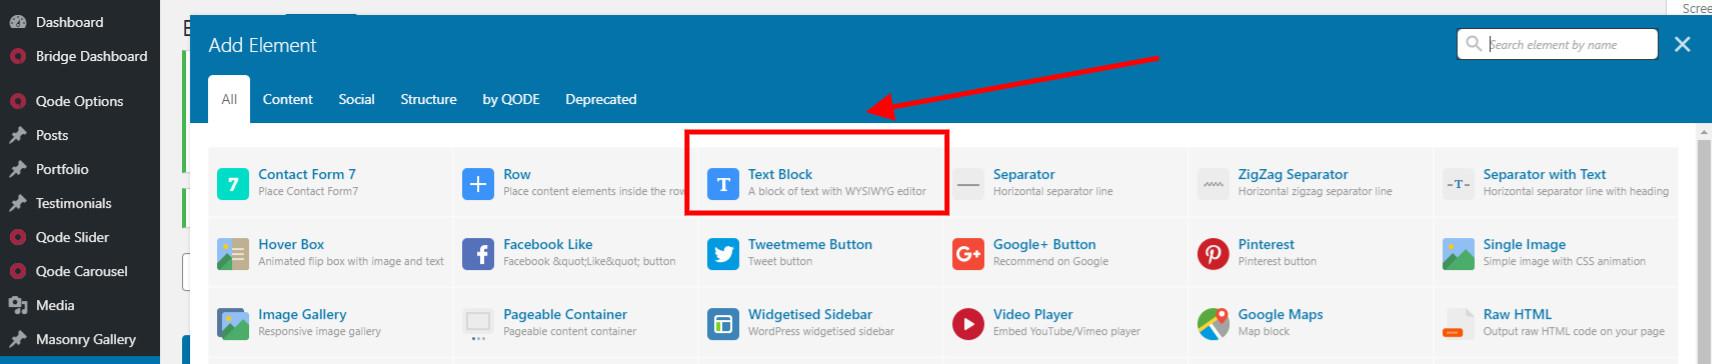 Add a text block